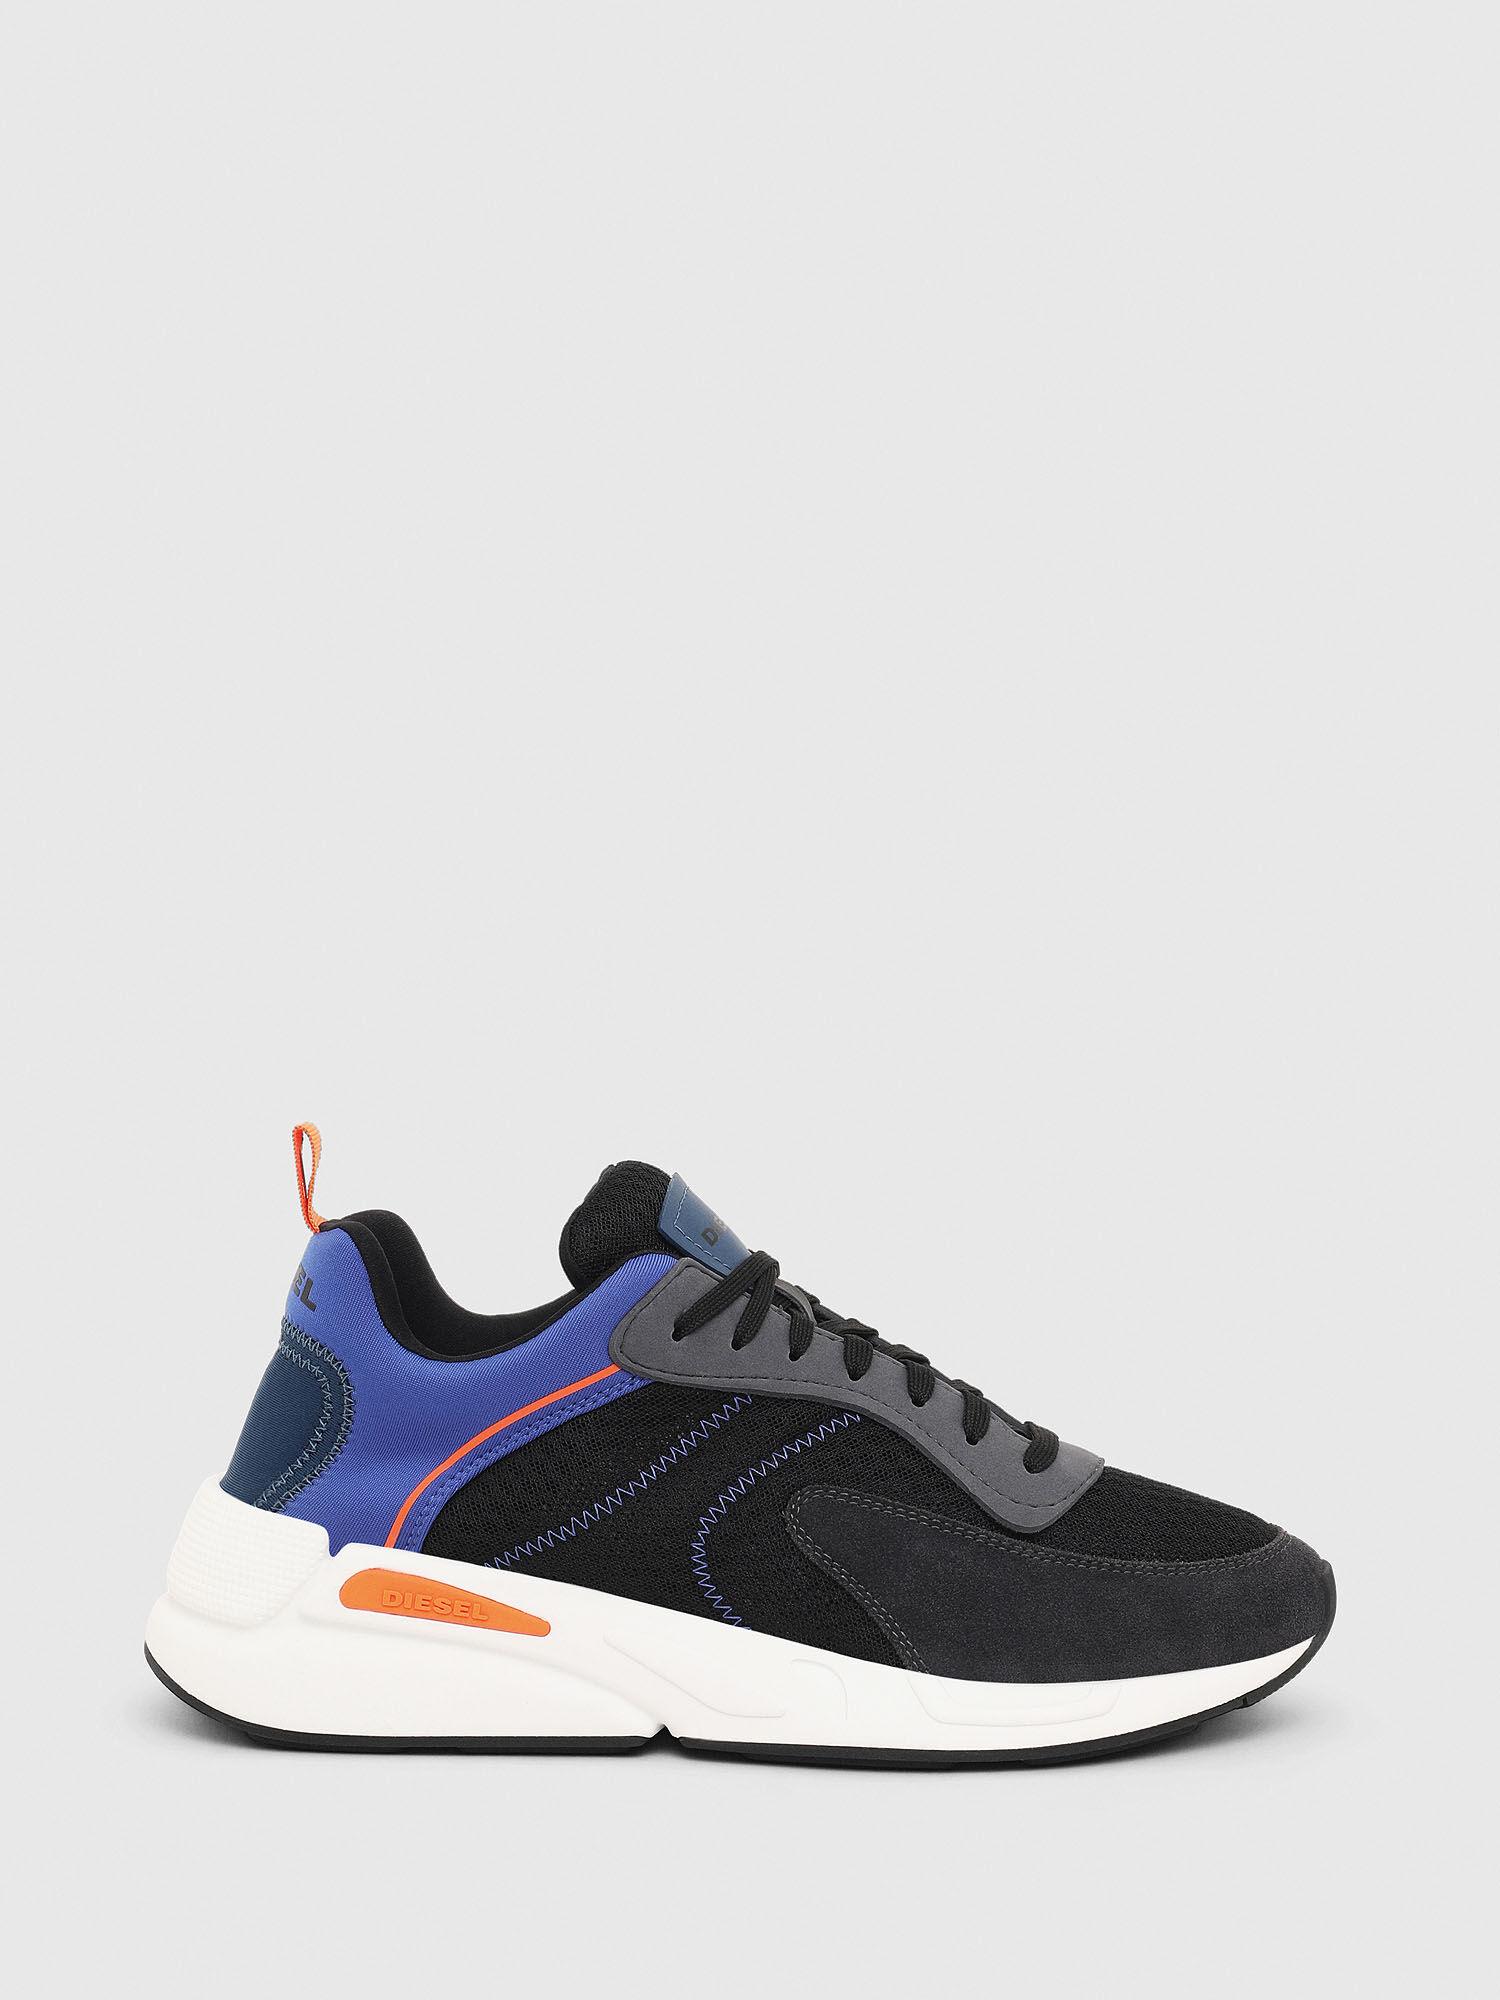 Men's Shoes: sneakers, boots | Diesel